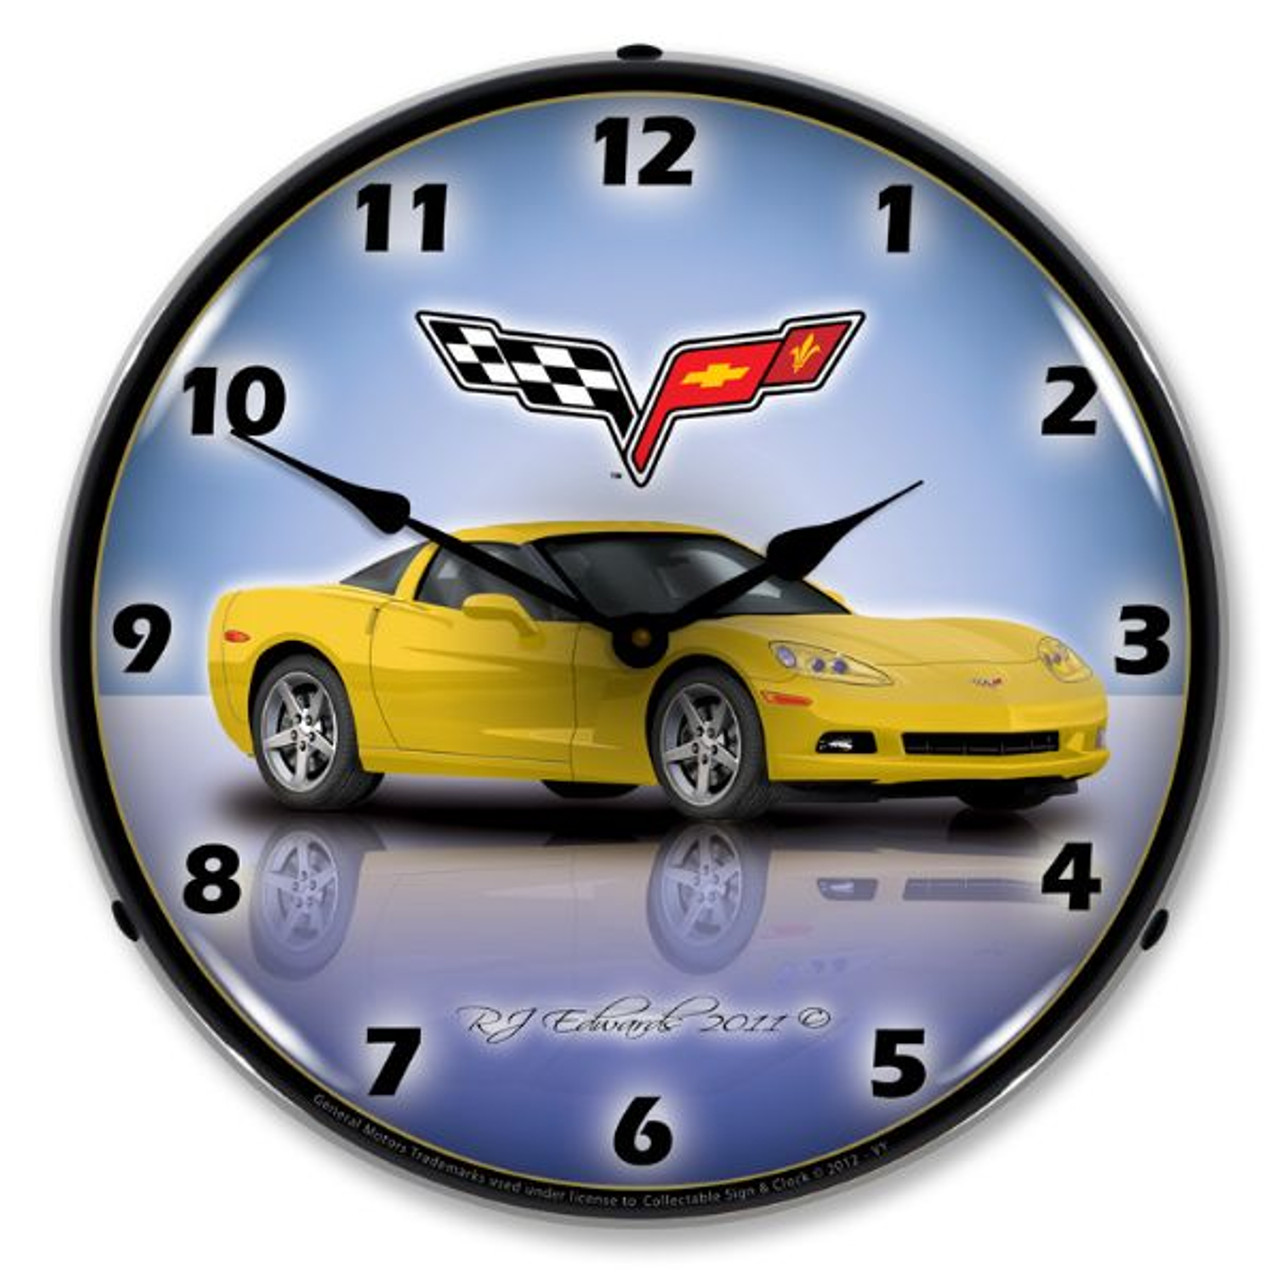 C6 Corvette Velocity Yellow Lighted Wall Clock 14 x 14 Inches